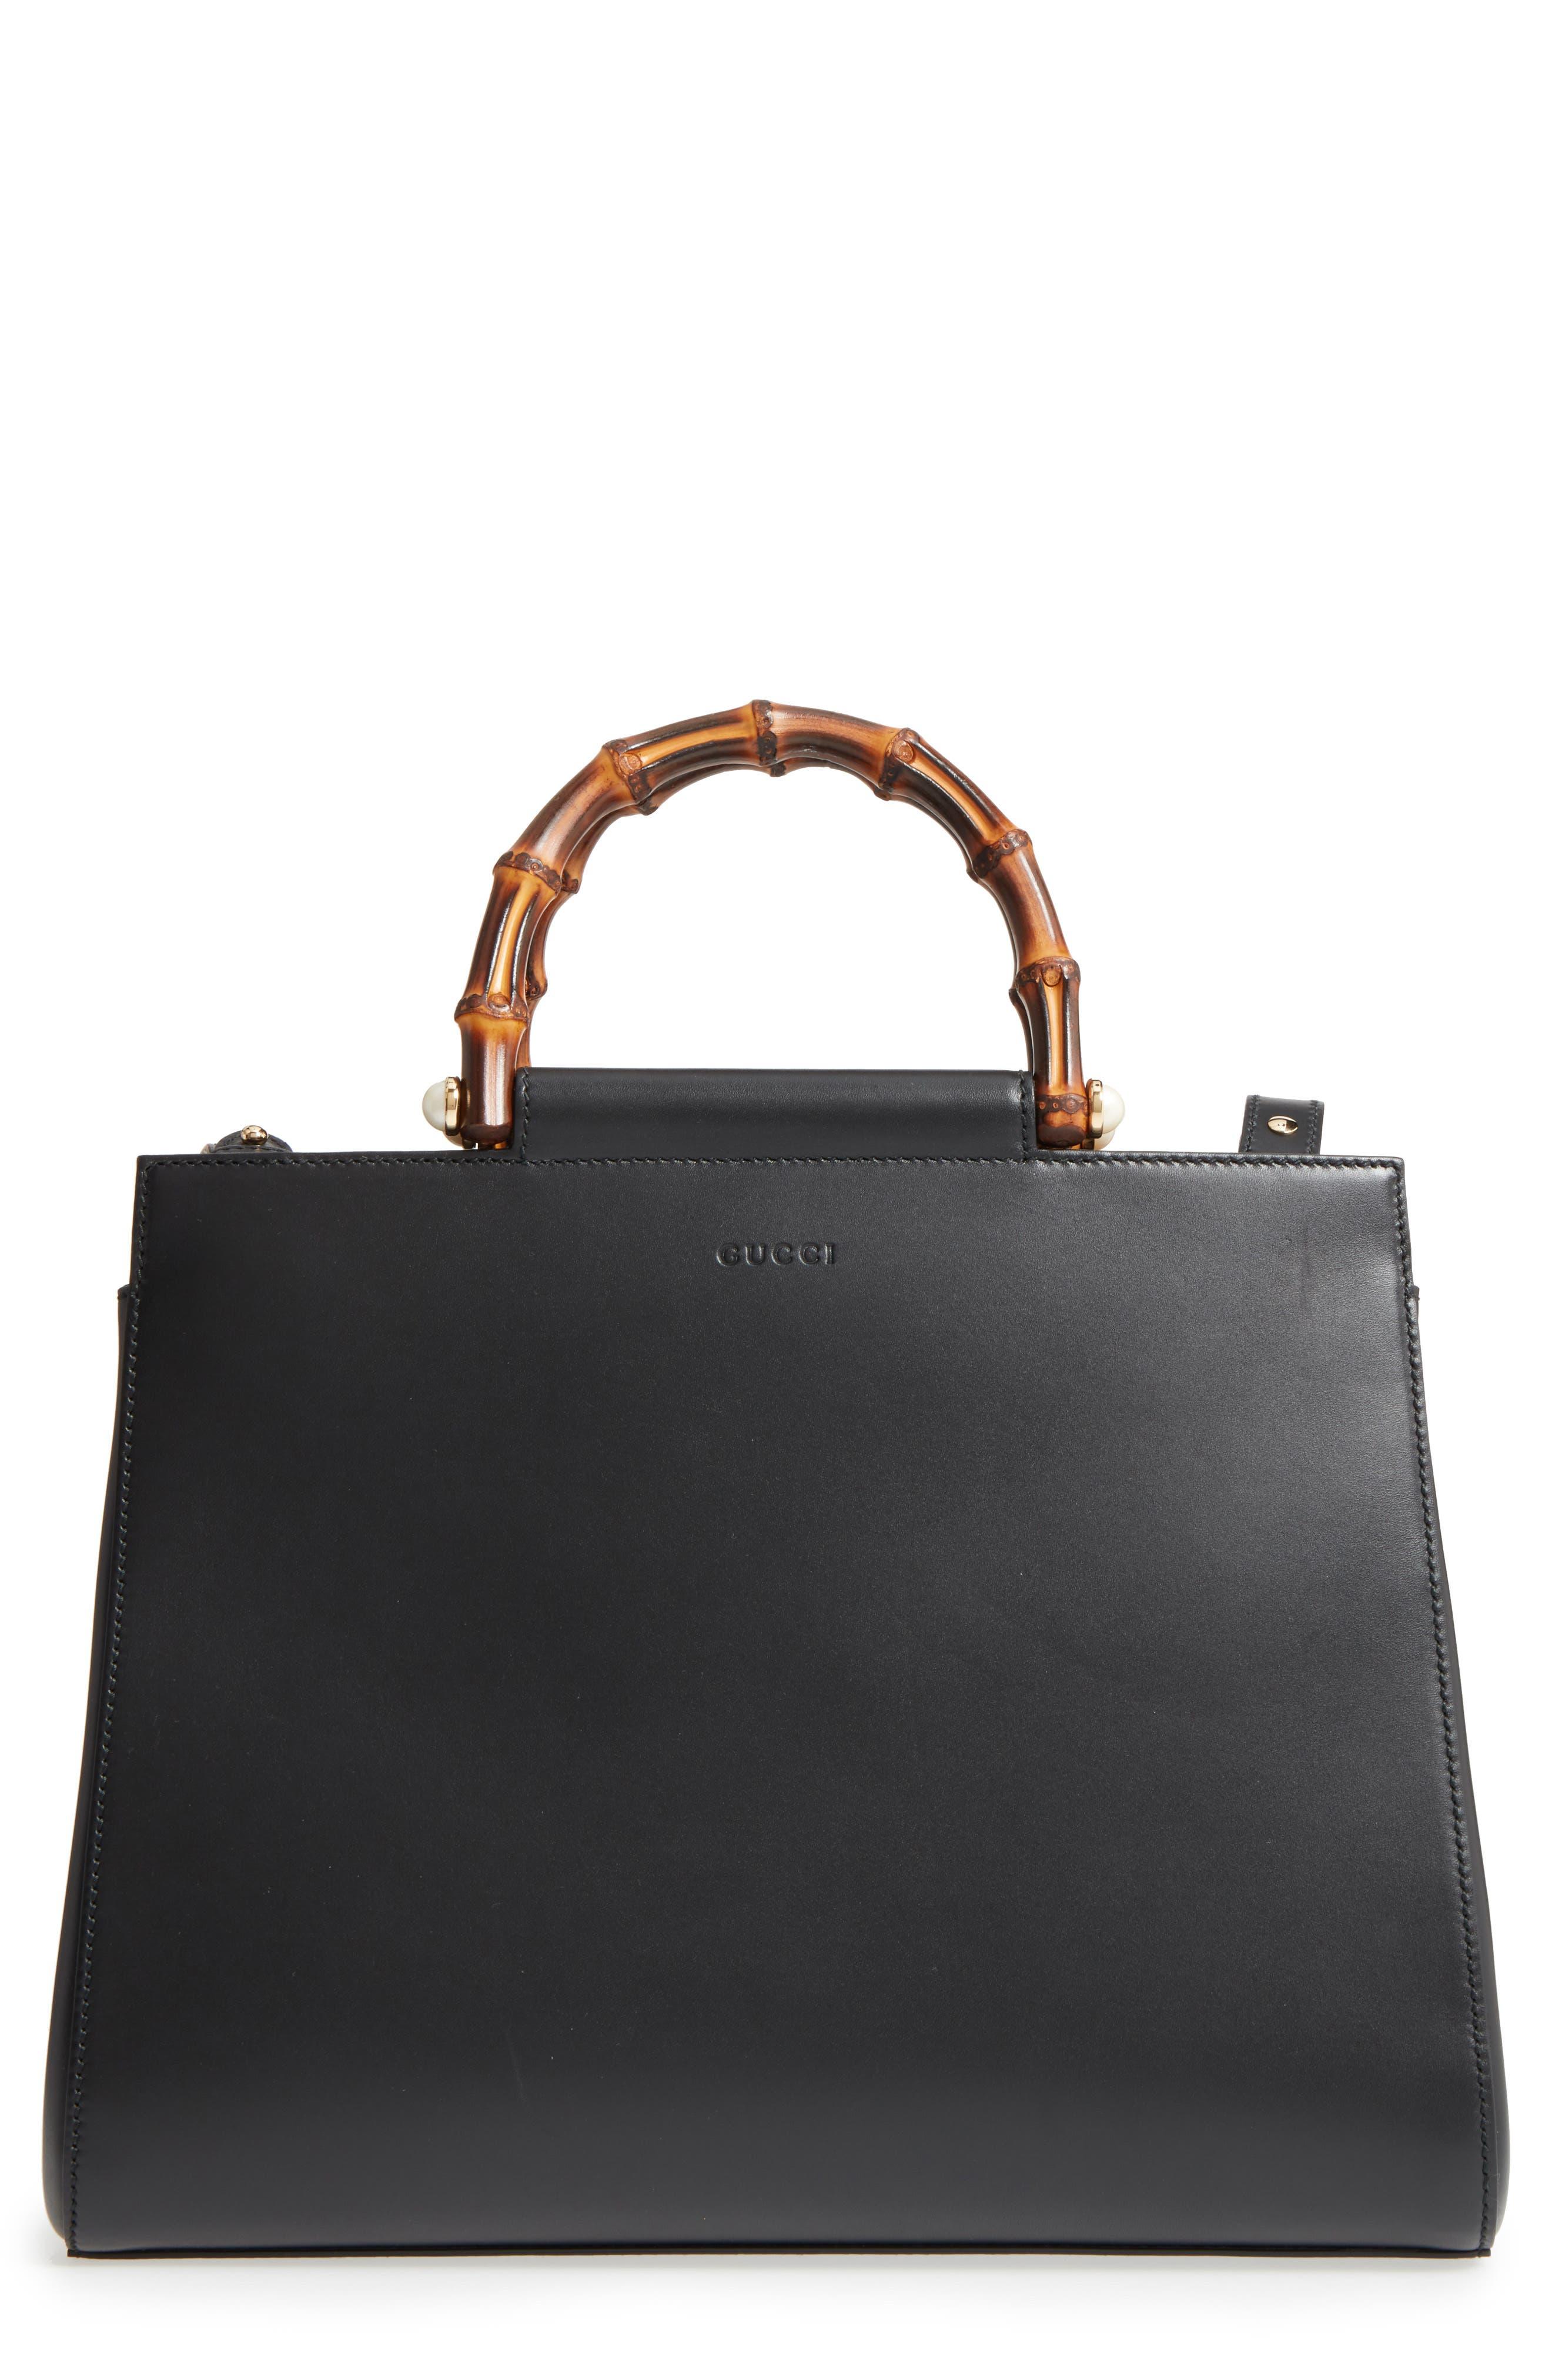 Gucci Medium Angel Leather Top Handle Satchel